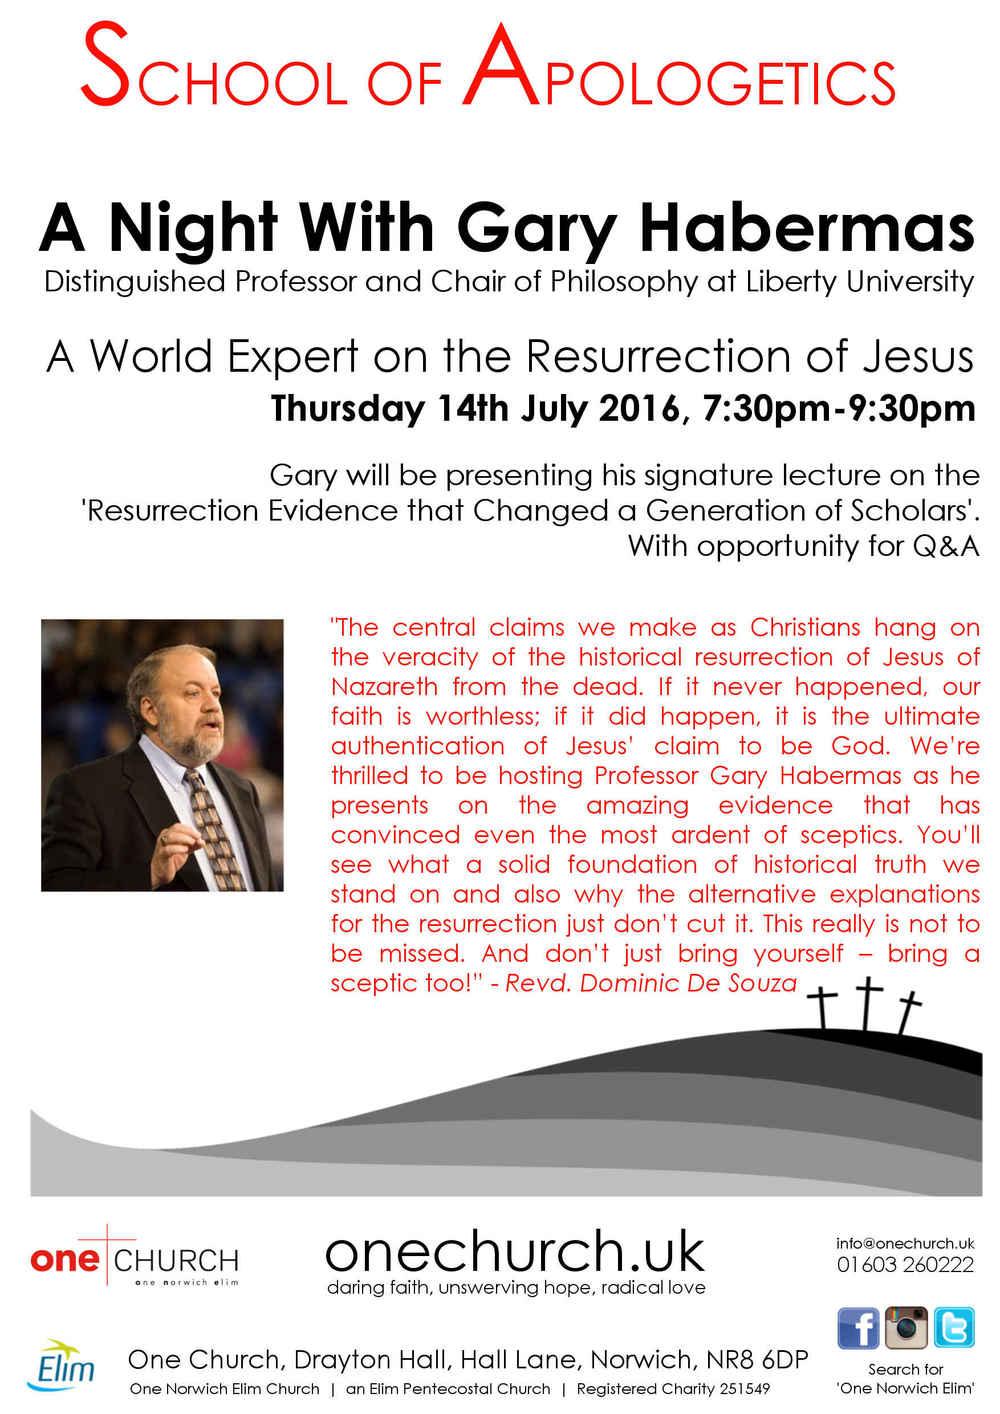 Gary Habermas, Norwich, School of Apologetics, One Church